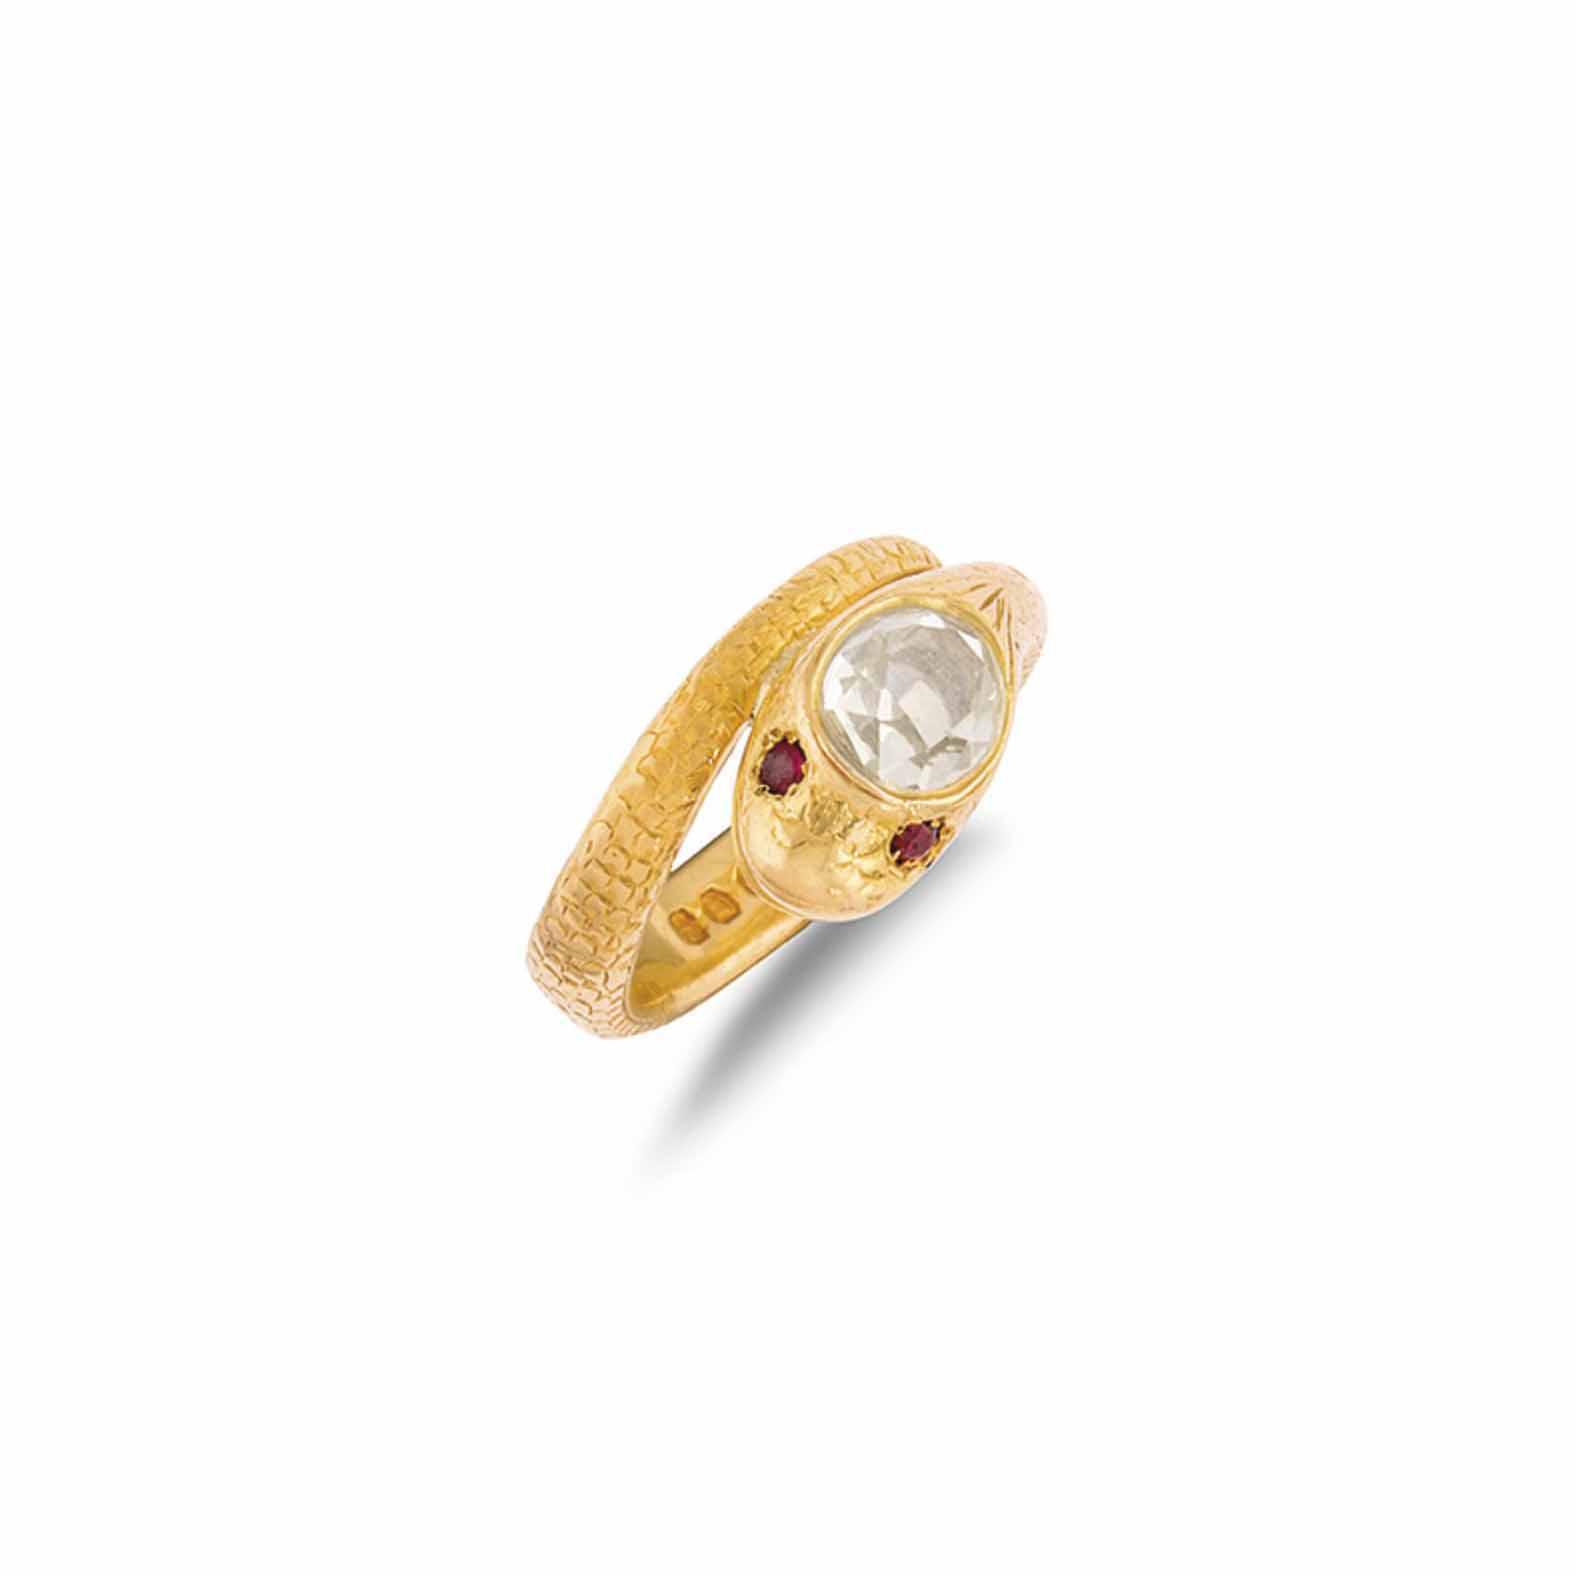 A DIAMOND SERPENT RING